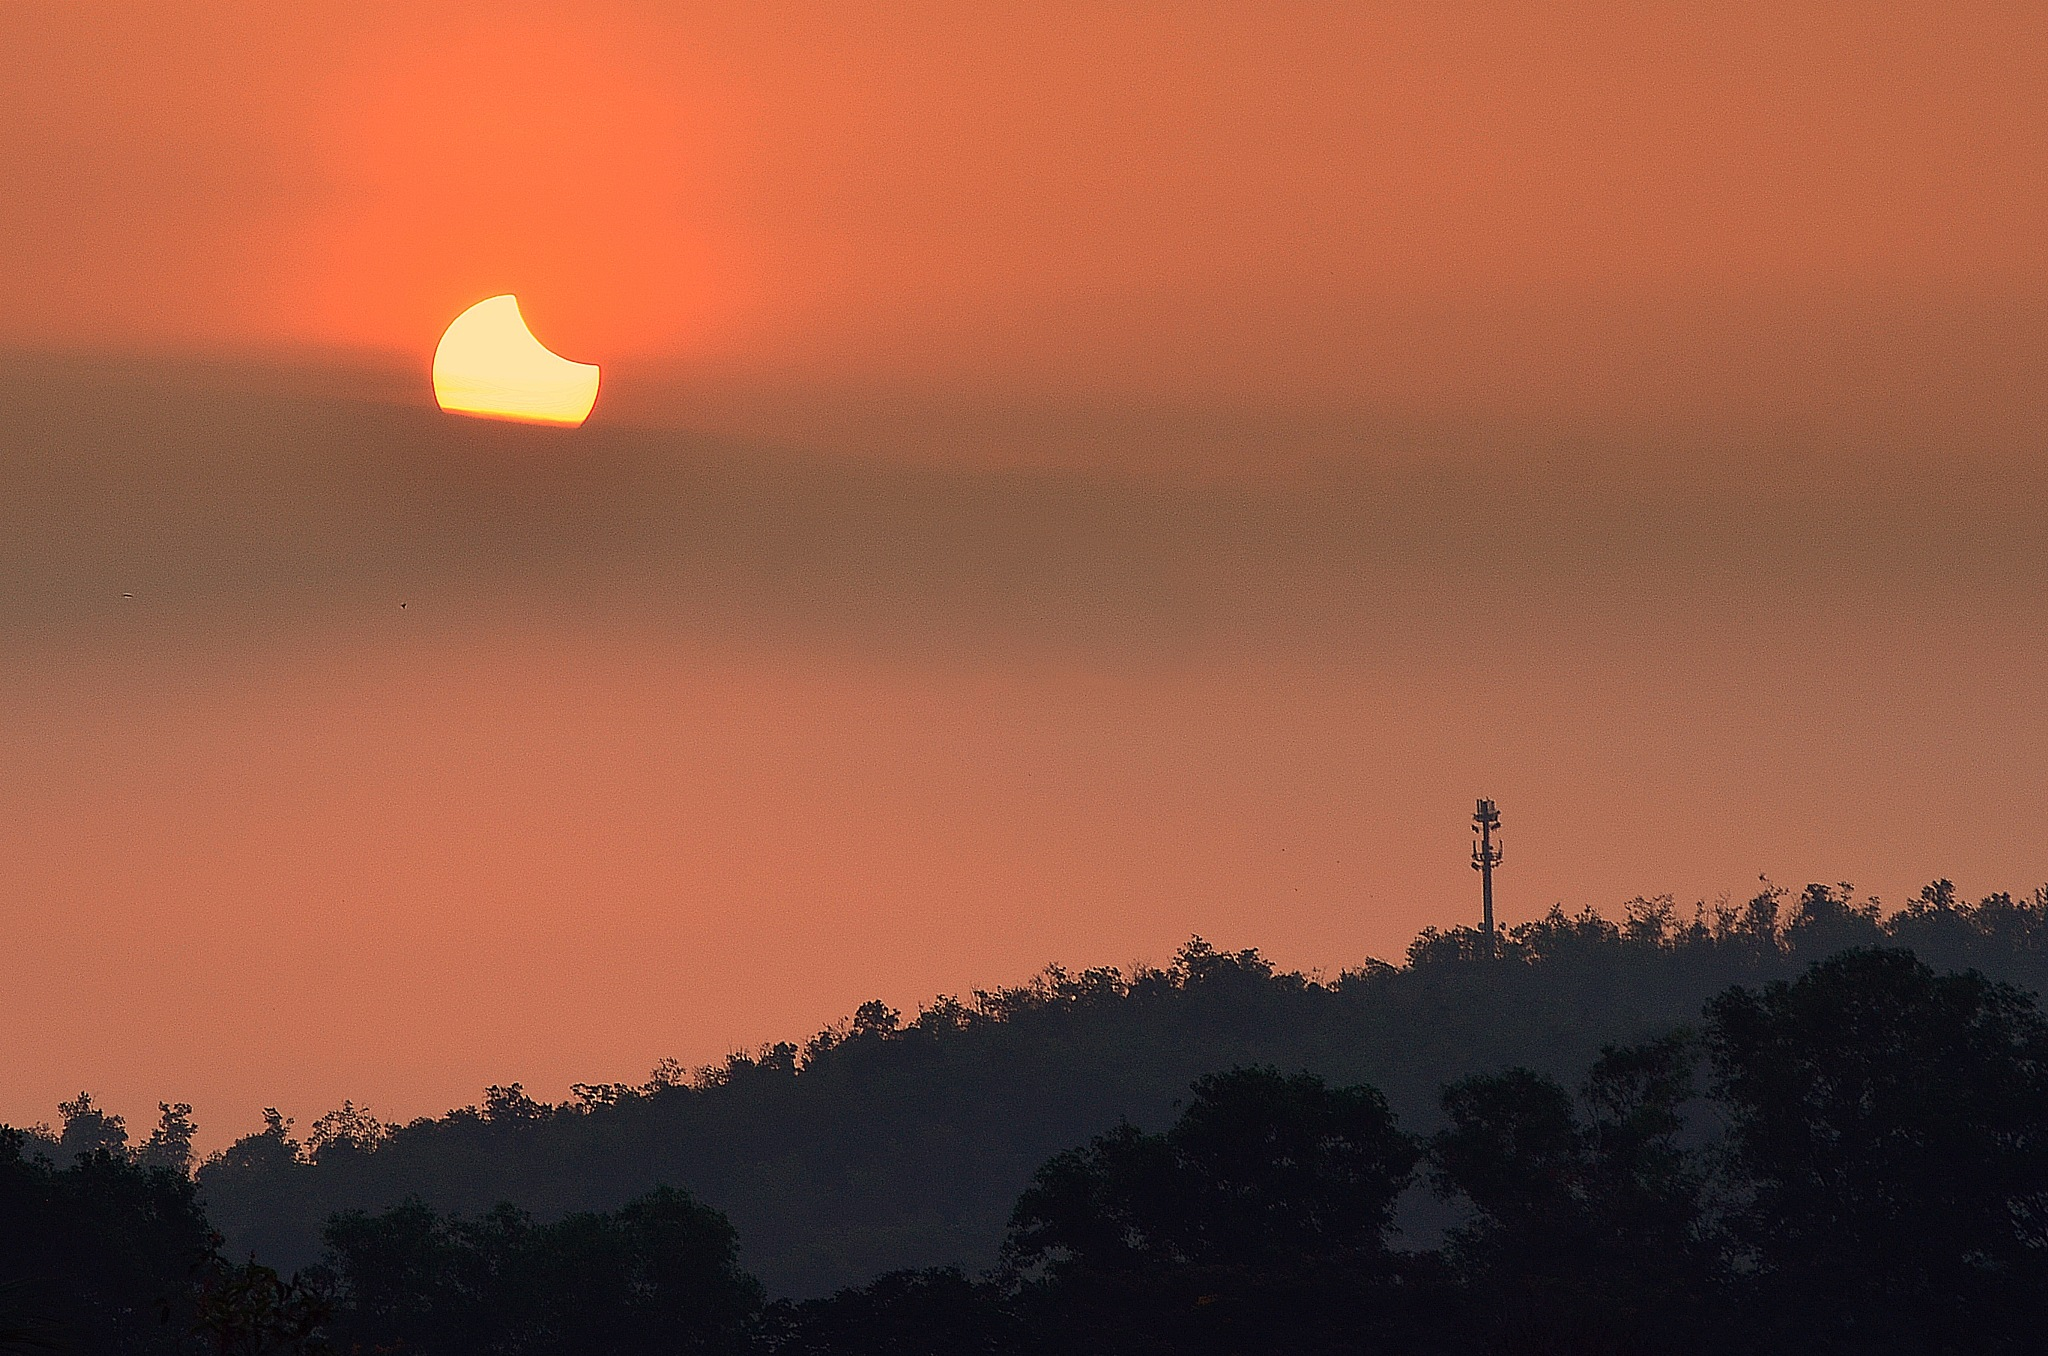 Sun equinox 10-3-2016 by FarizMahmood